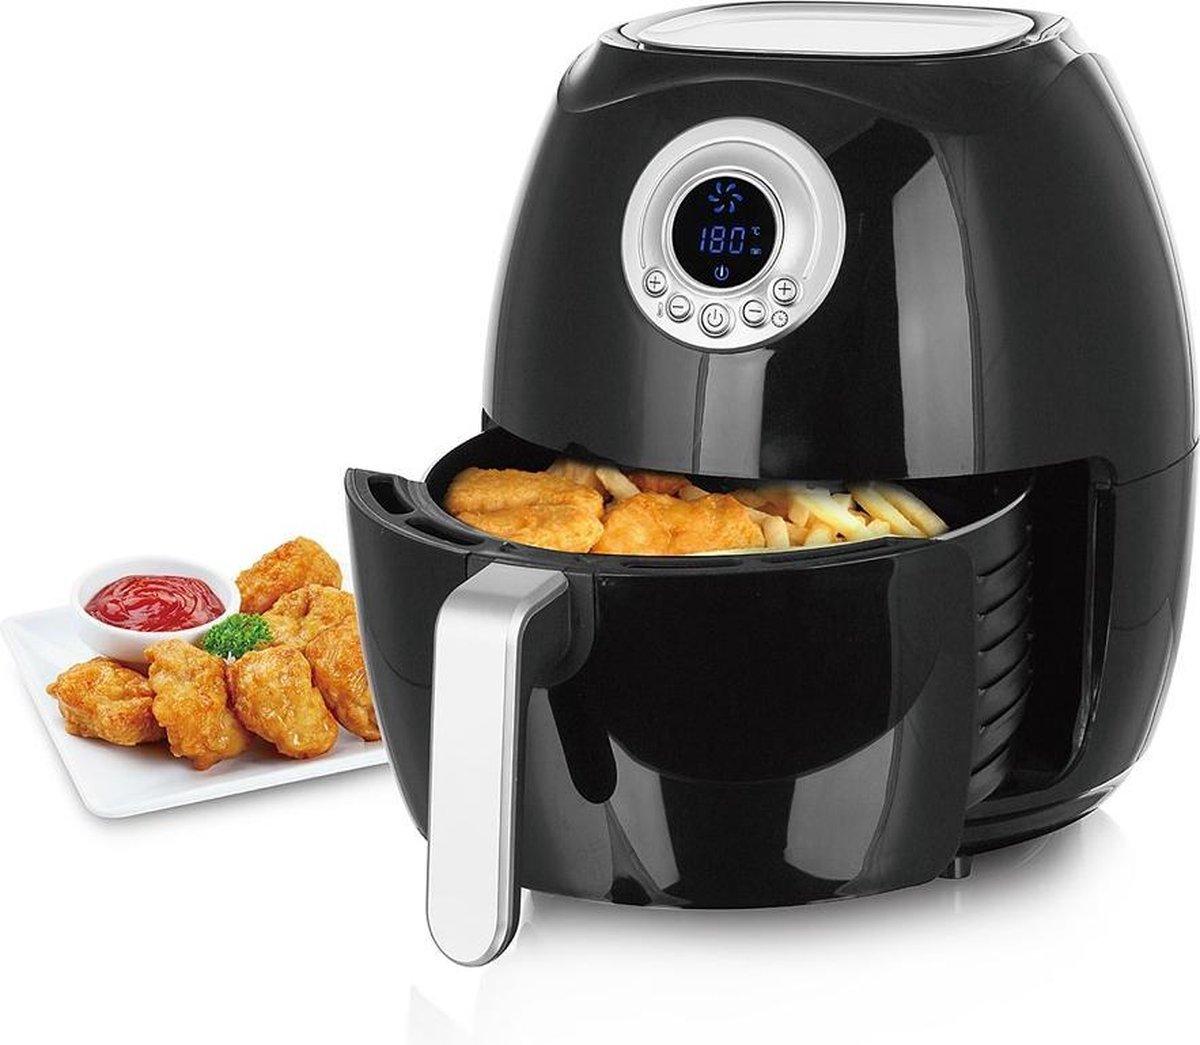 Hetelucht friteuse - Smart fryer - 4,5L- Airfryer - Zwart - 1500W